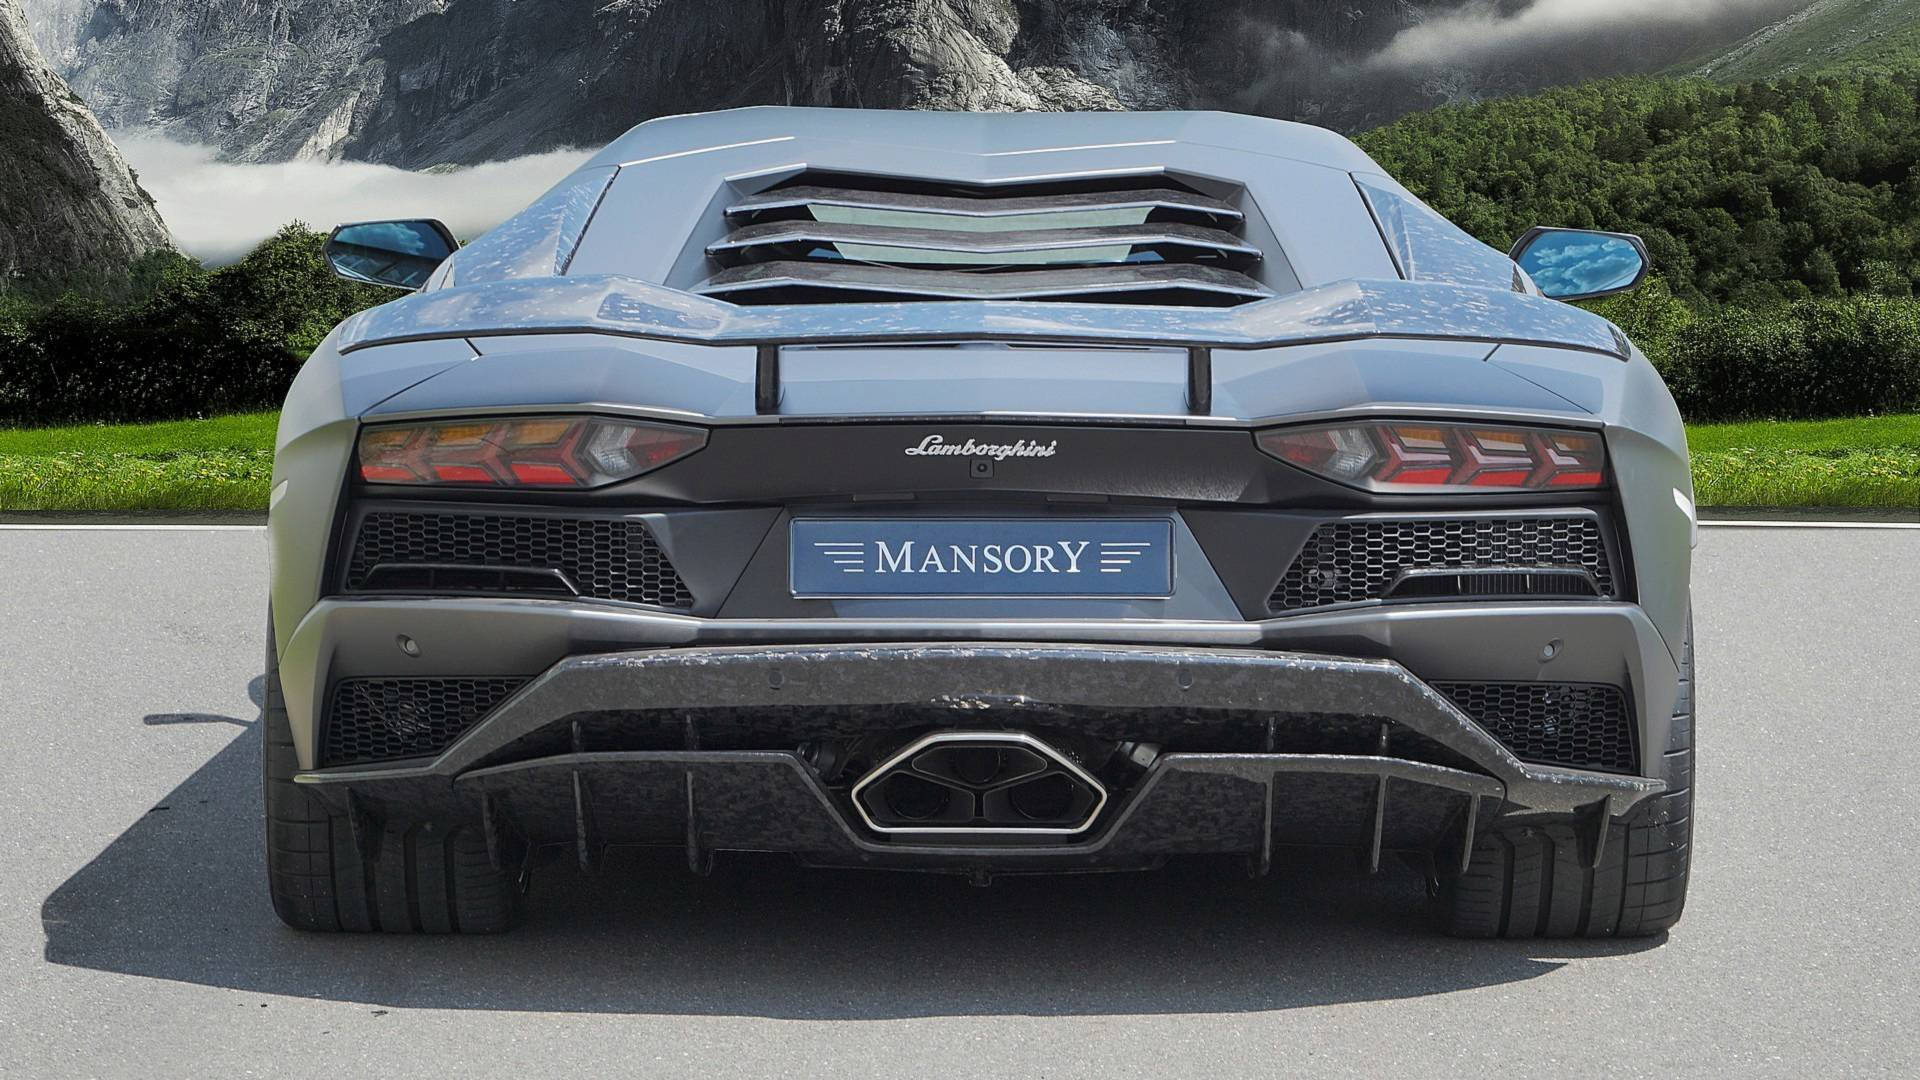 Lamborghini Aventador S by Mansory (4)